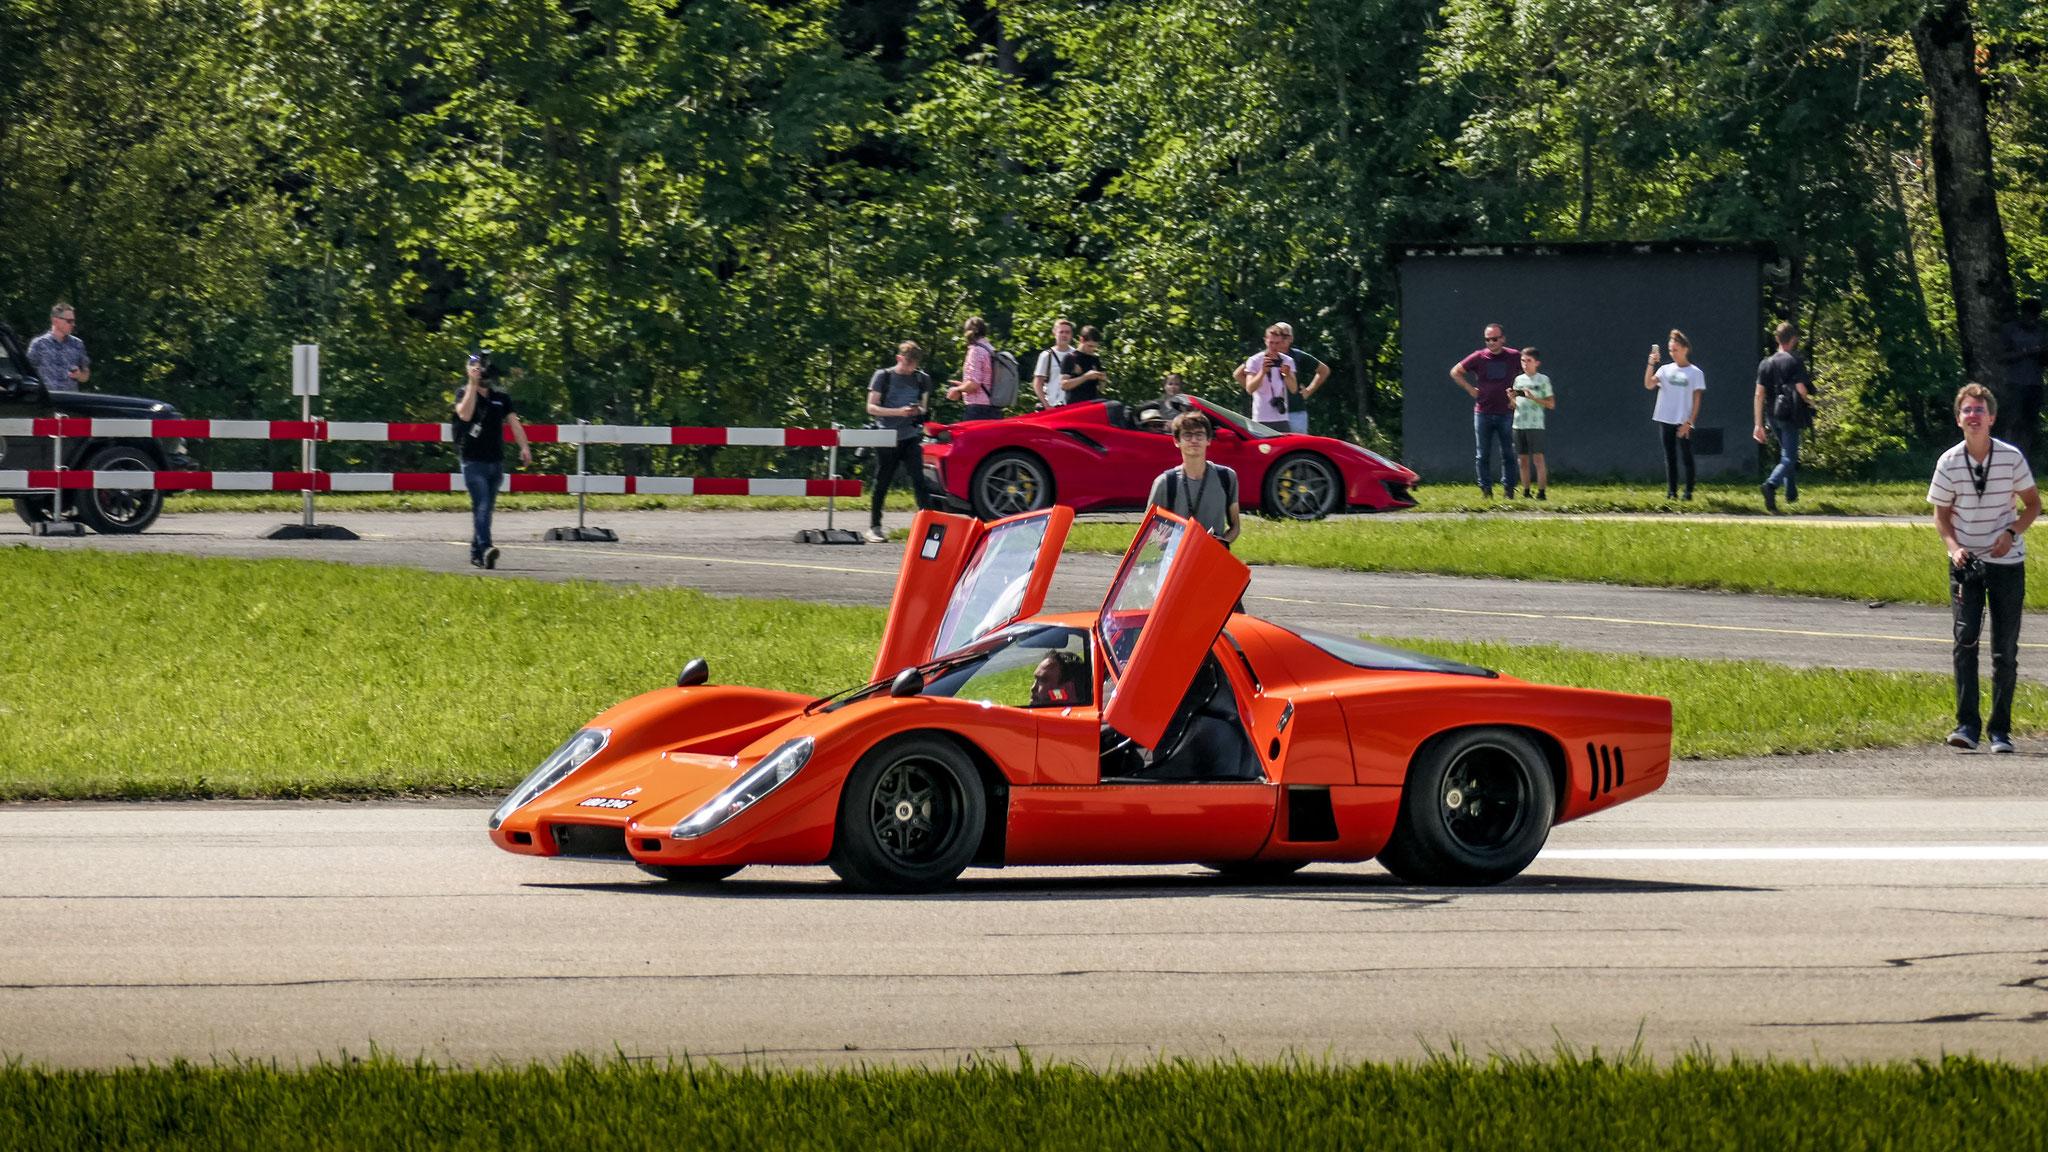 McLaren M6 GT - UBD-234G (GB)